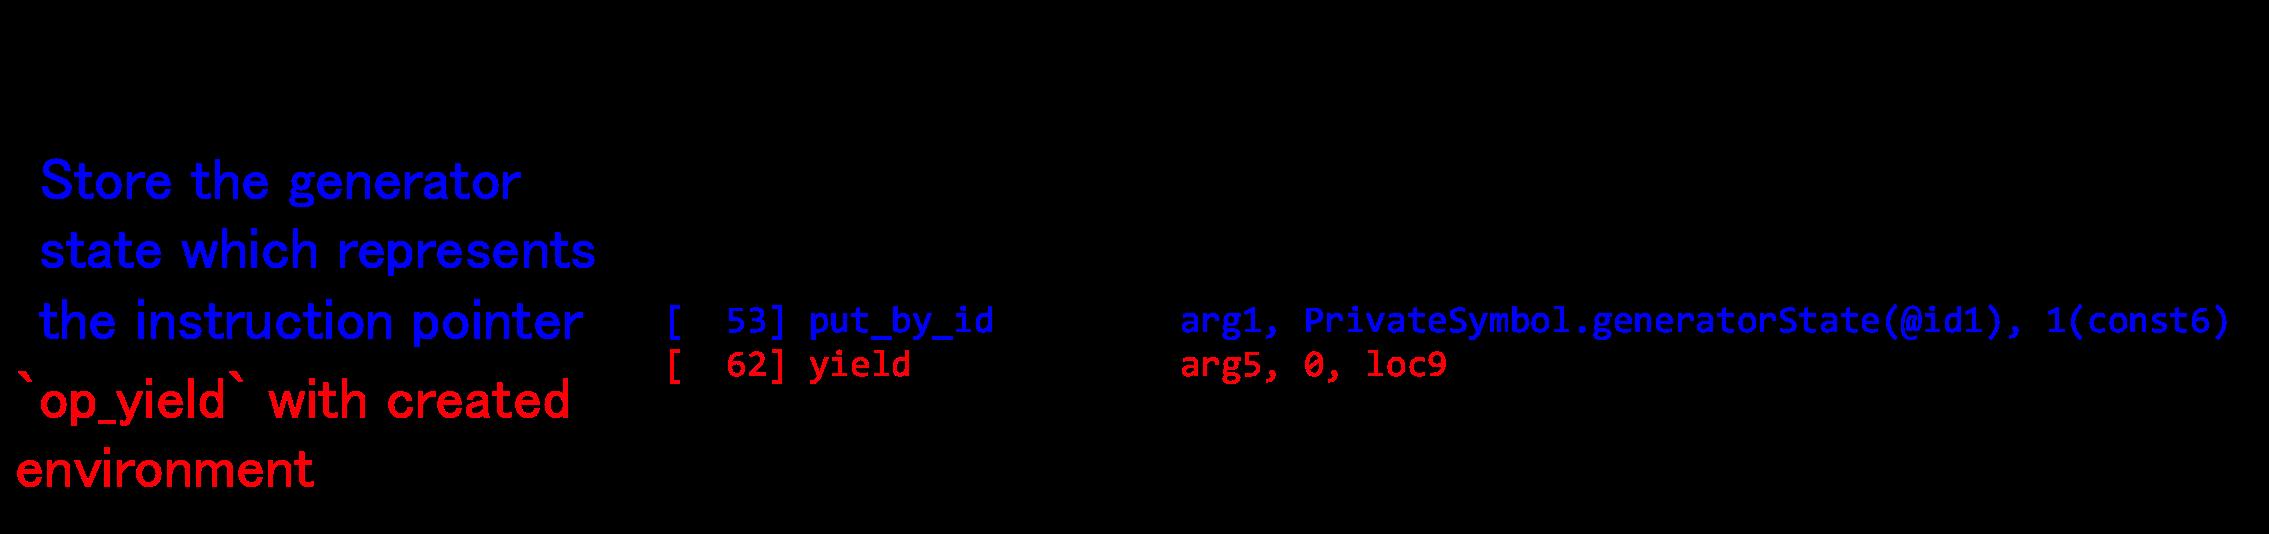 Pre-Generatorification bytecode